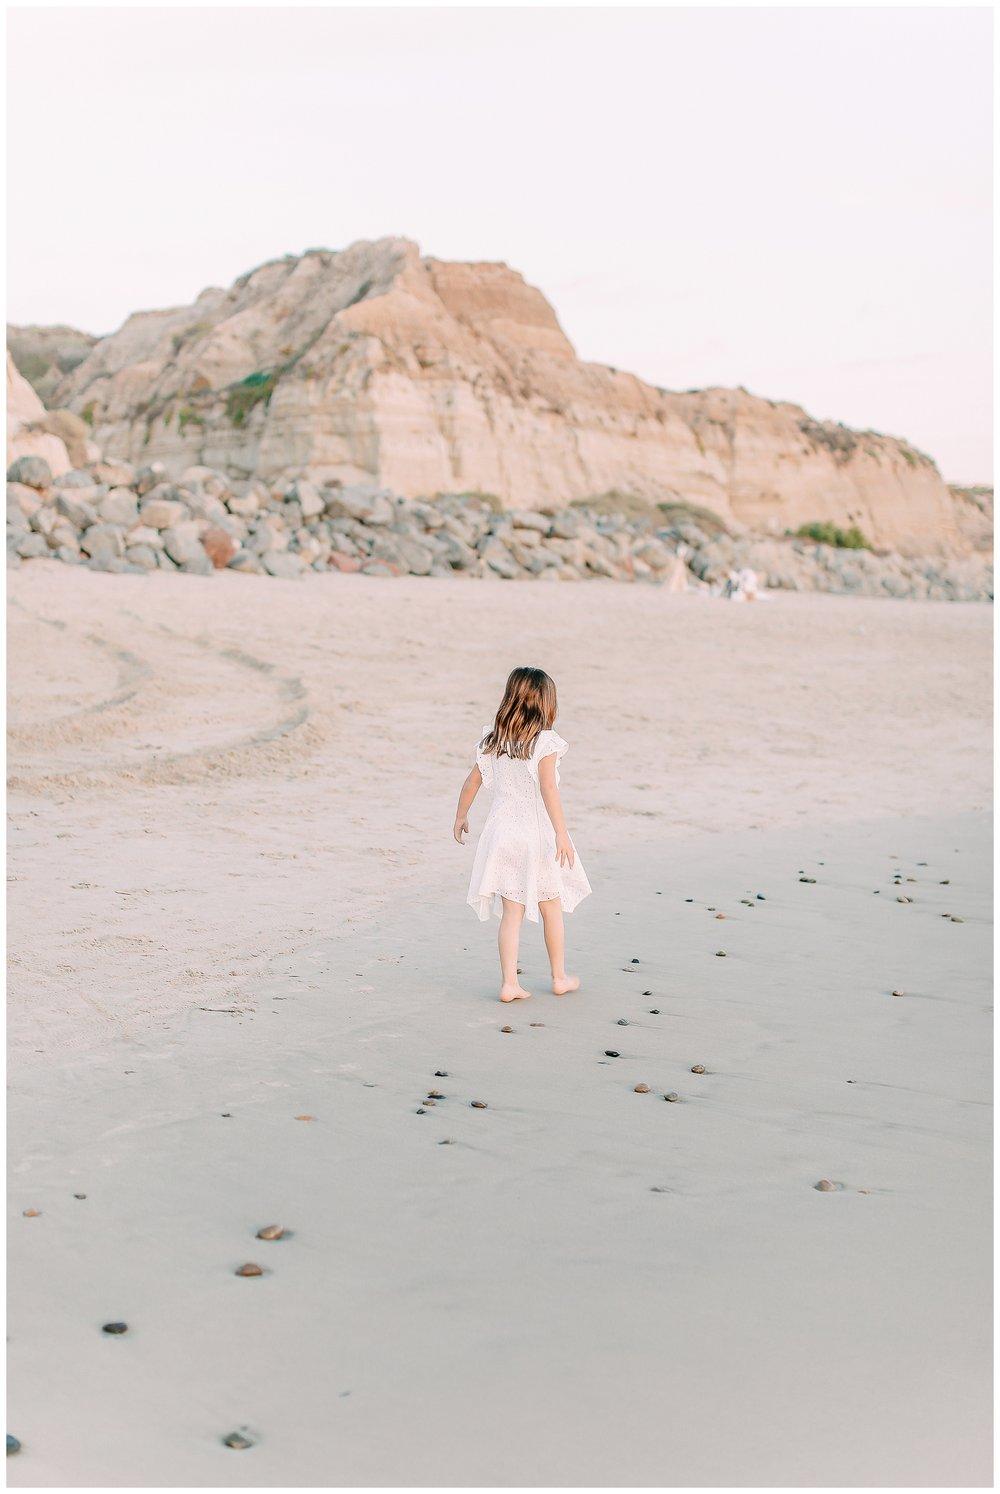 San_clemente_family_session_Orange_county_family_photographer_cori_kleckner_photography_laguna_beach_family_session_0707.jpg